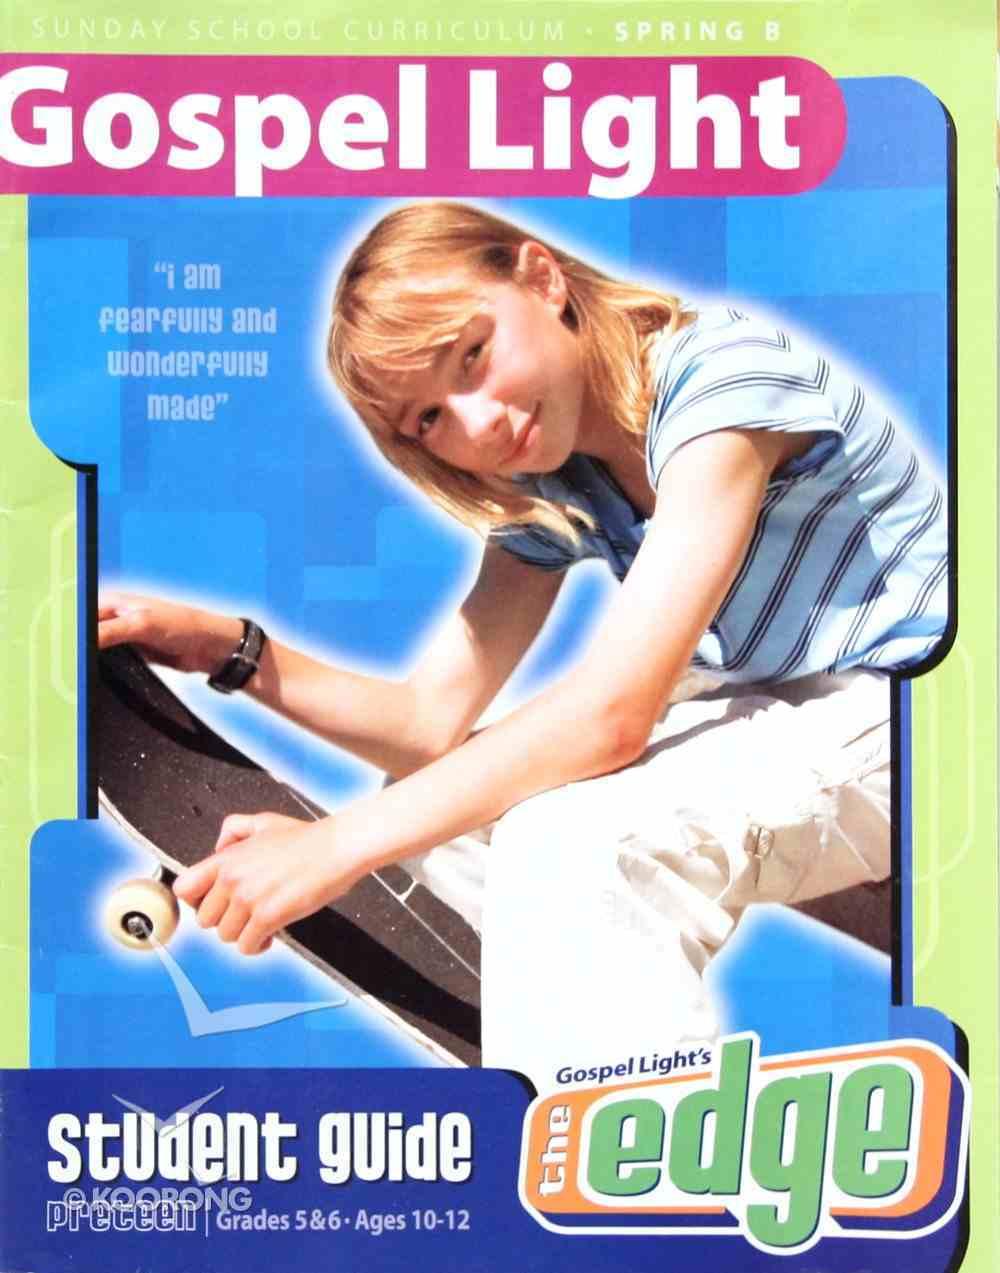 Spring B 2021 Grades 5&6 Student Guide (Gospel Light Living Word Series) Paperback